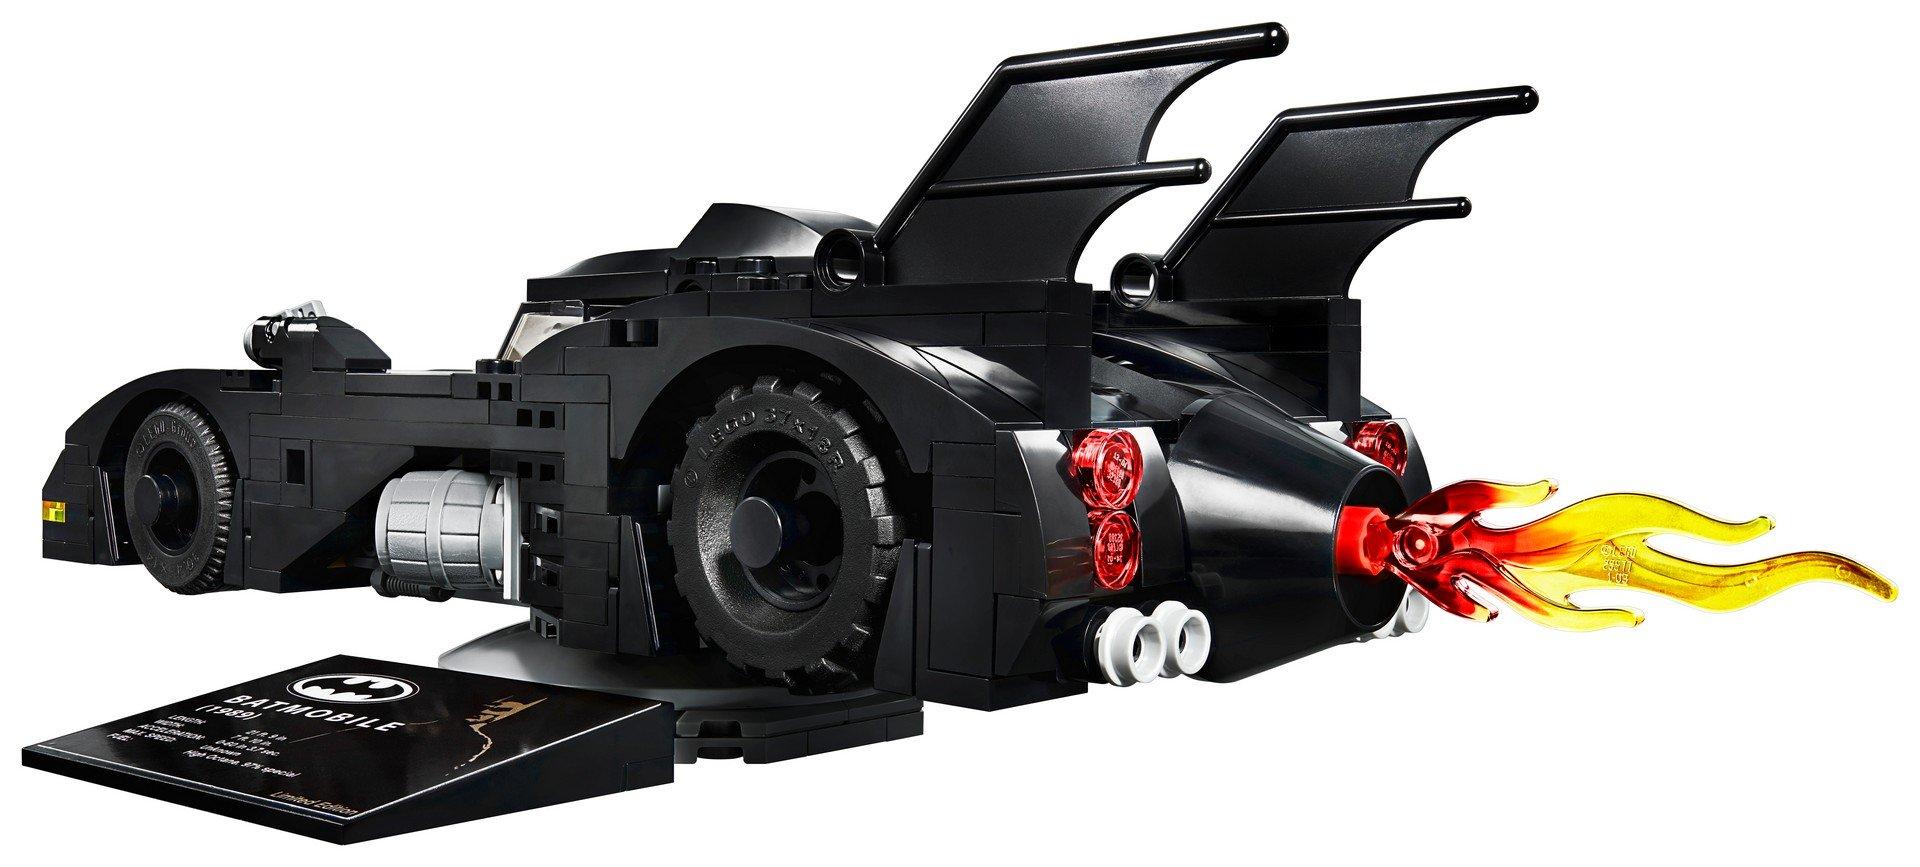 Lego-Batmobile-kit-1989-4